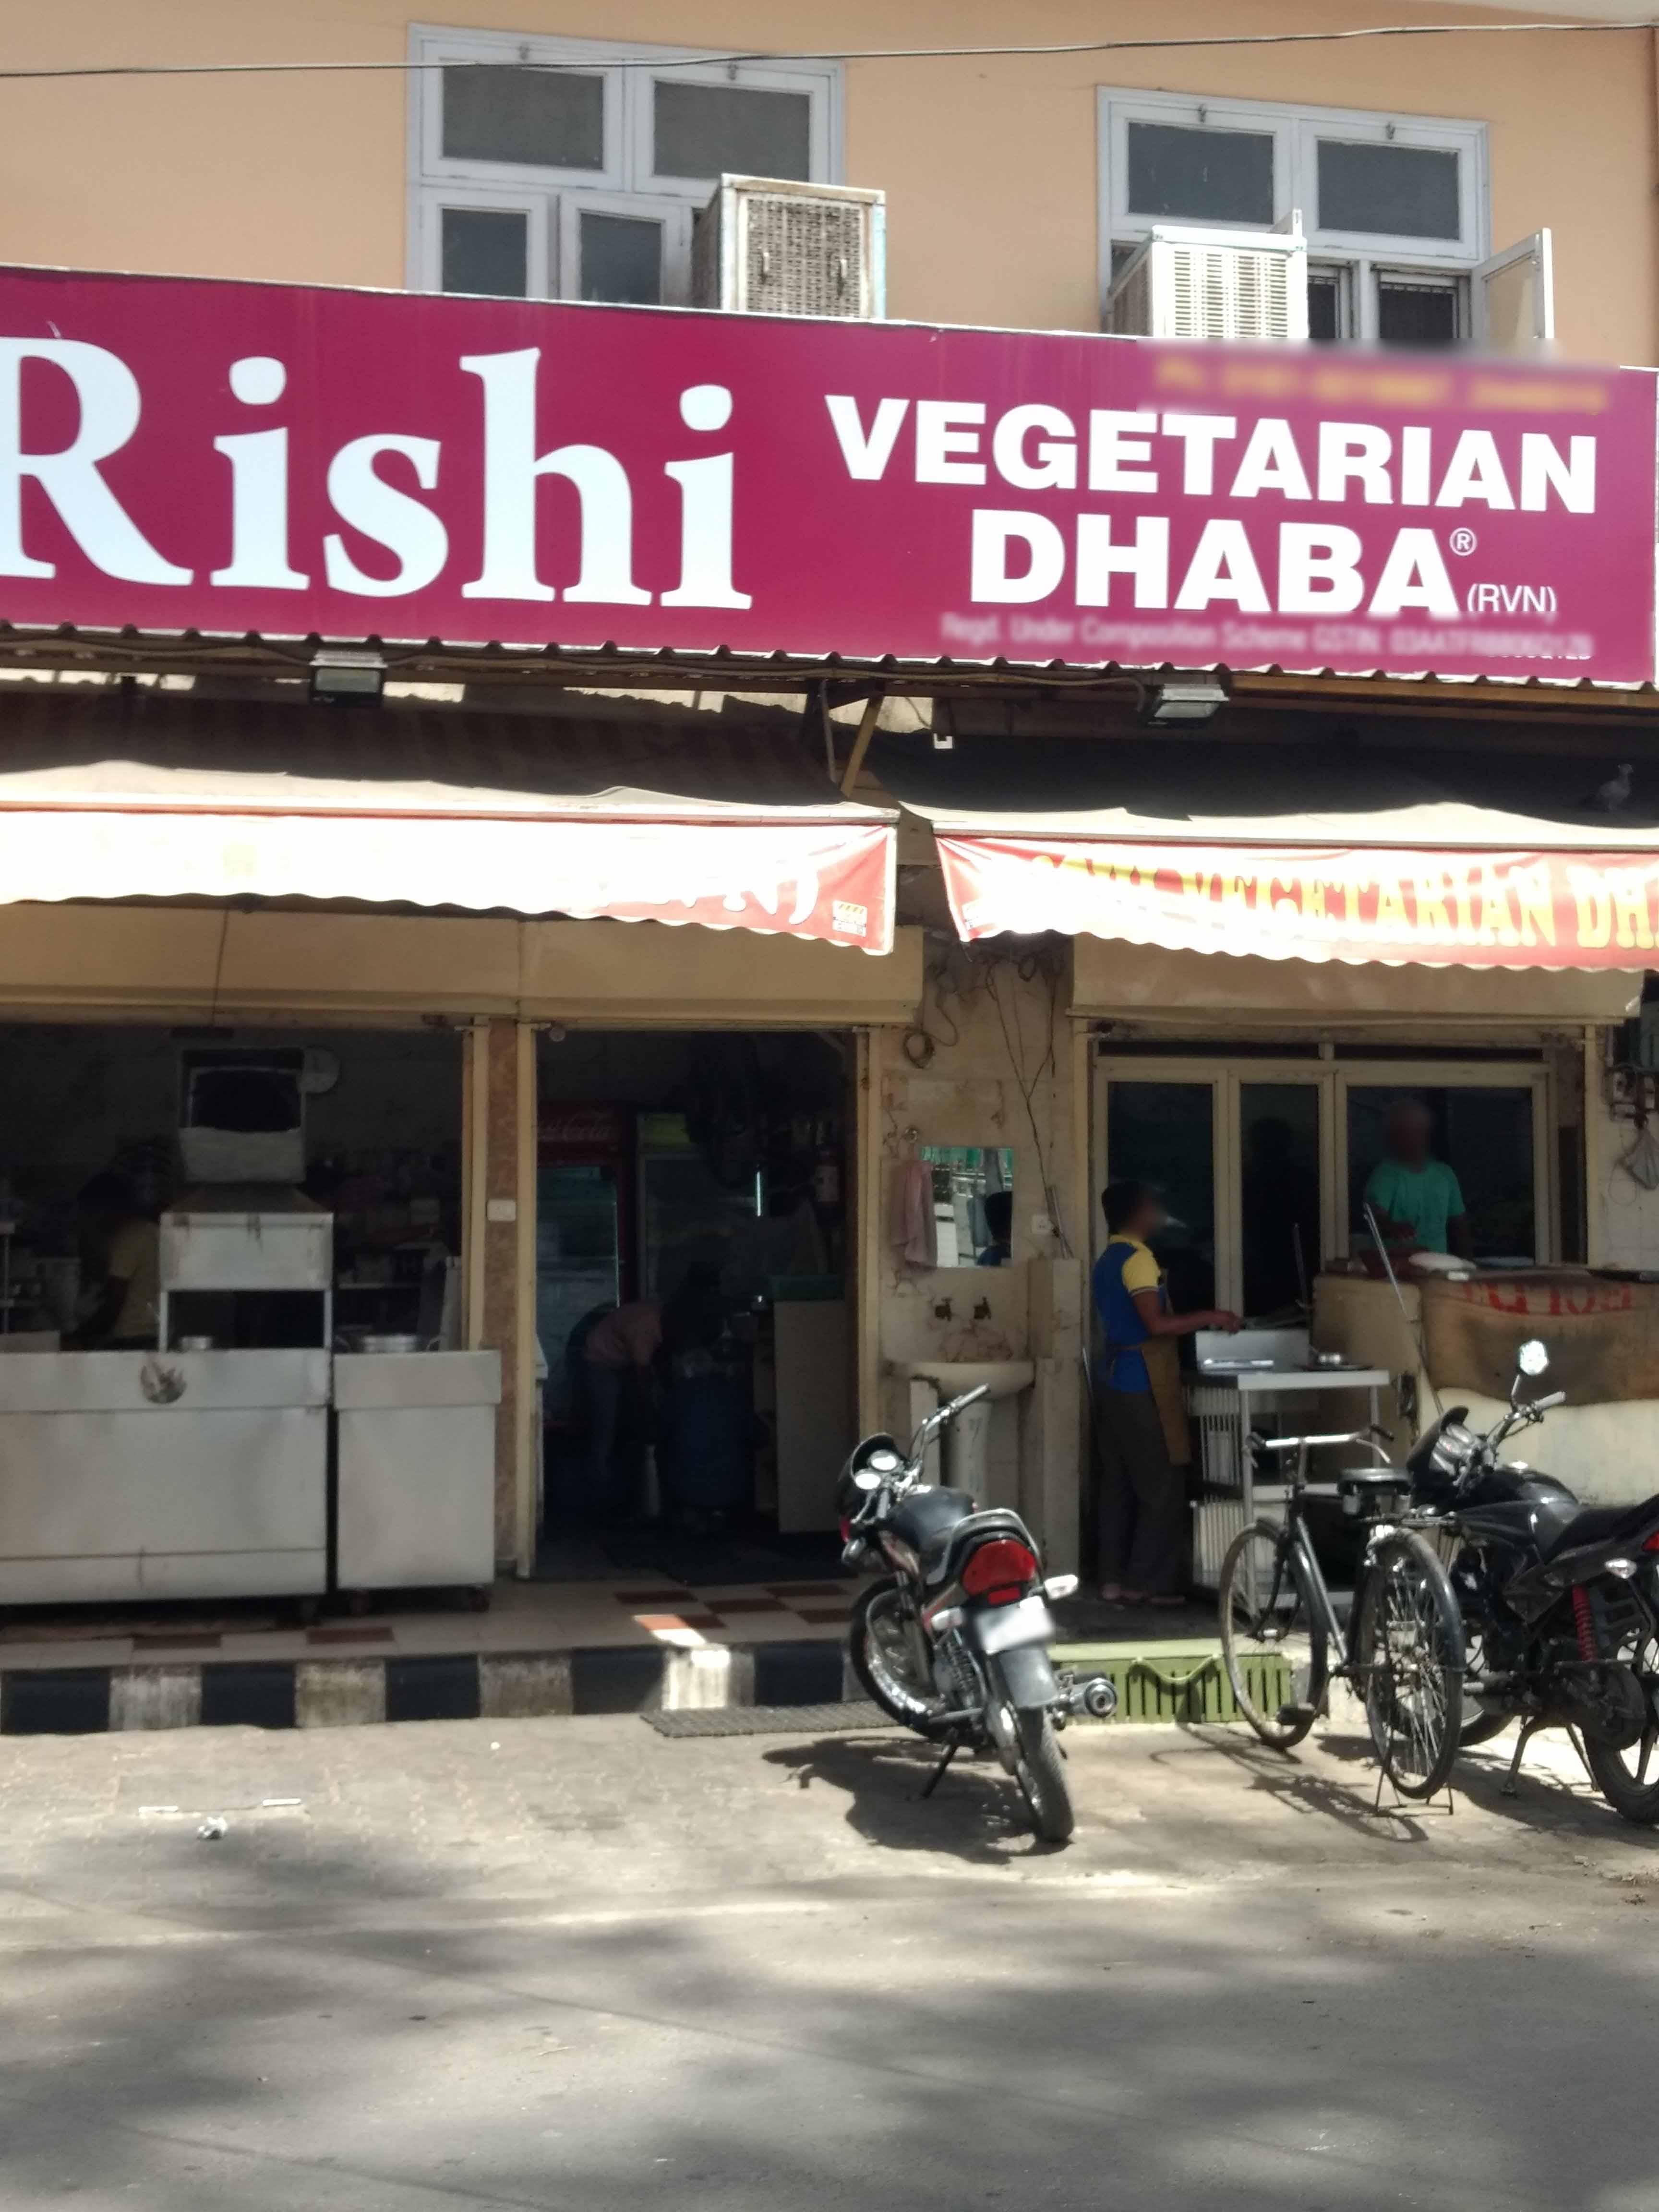 Rishi Vegetarian Dhaba - Model Town - Ludhiana Image